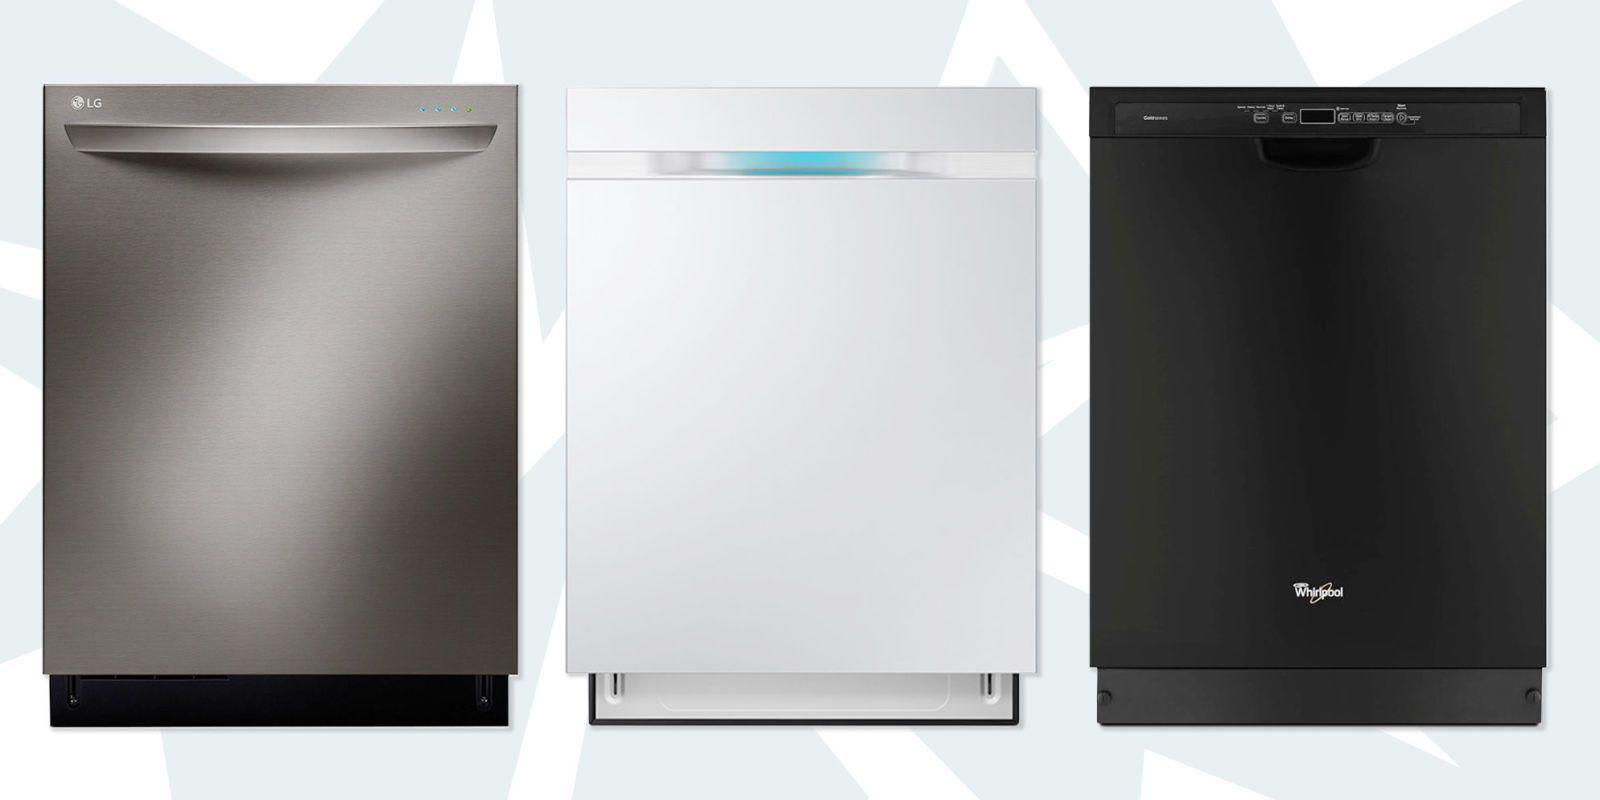 Kitchenaid Kdtm354dss Dishwasher Best Dishwasher Best Rated